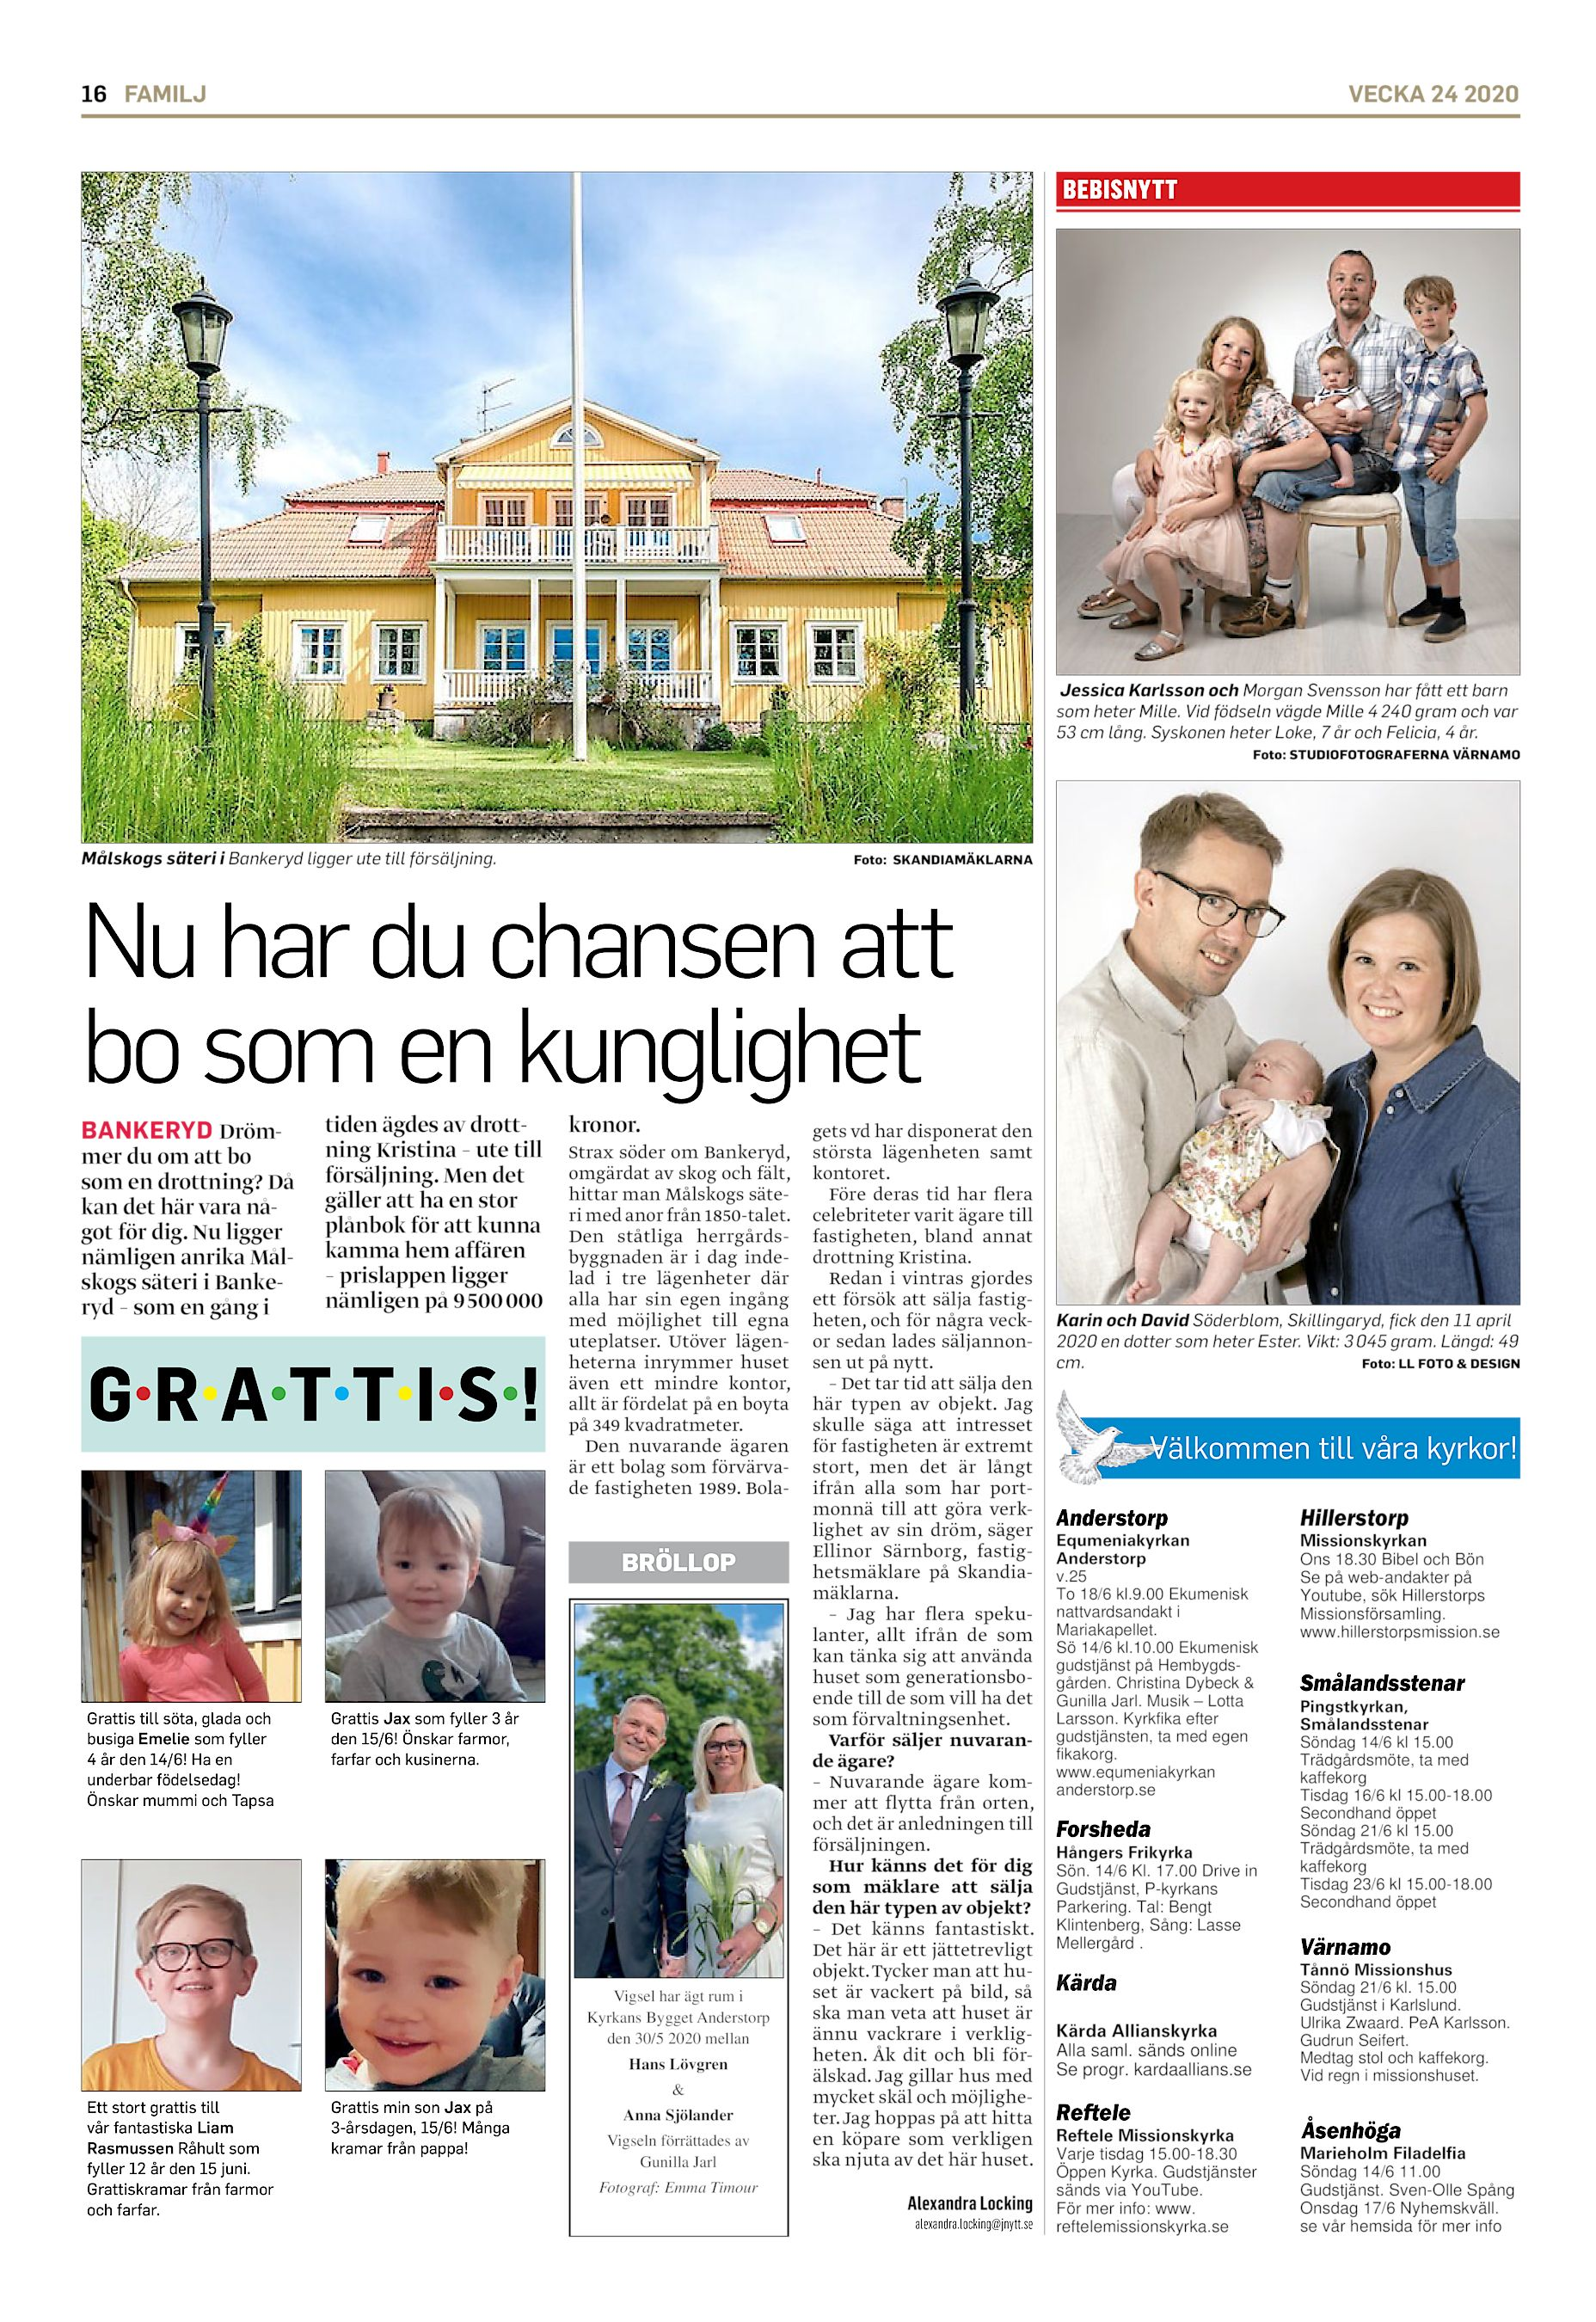 Pr Lundberg, 39 r i Forsheda p Kolabo 1 - telefon, lder